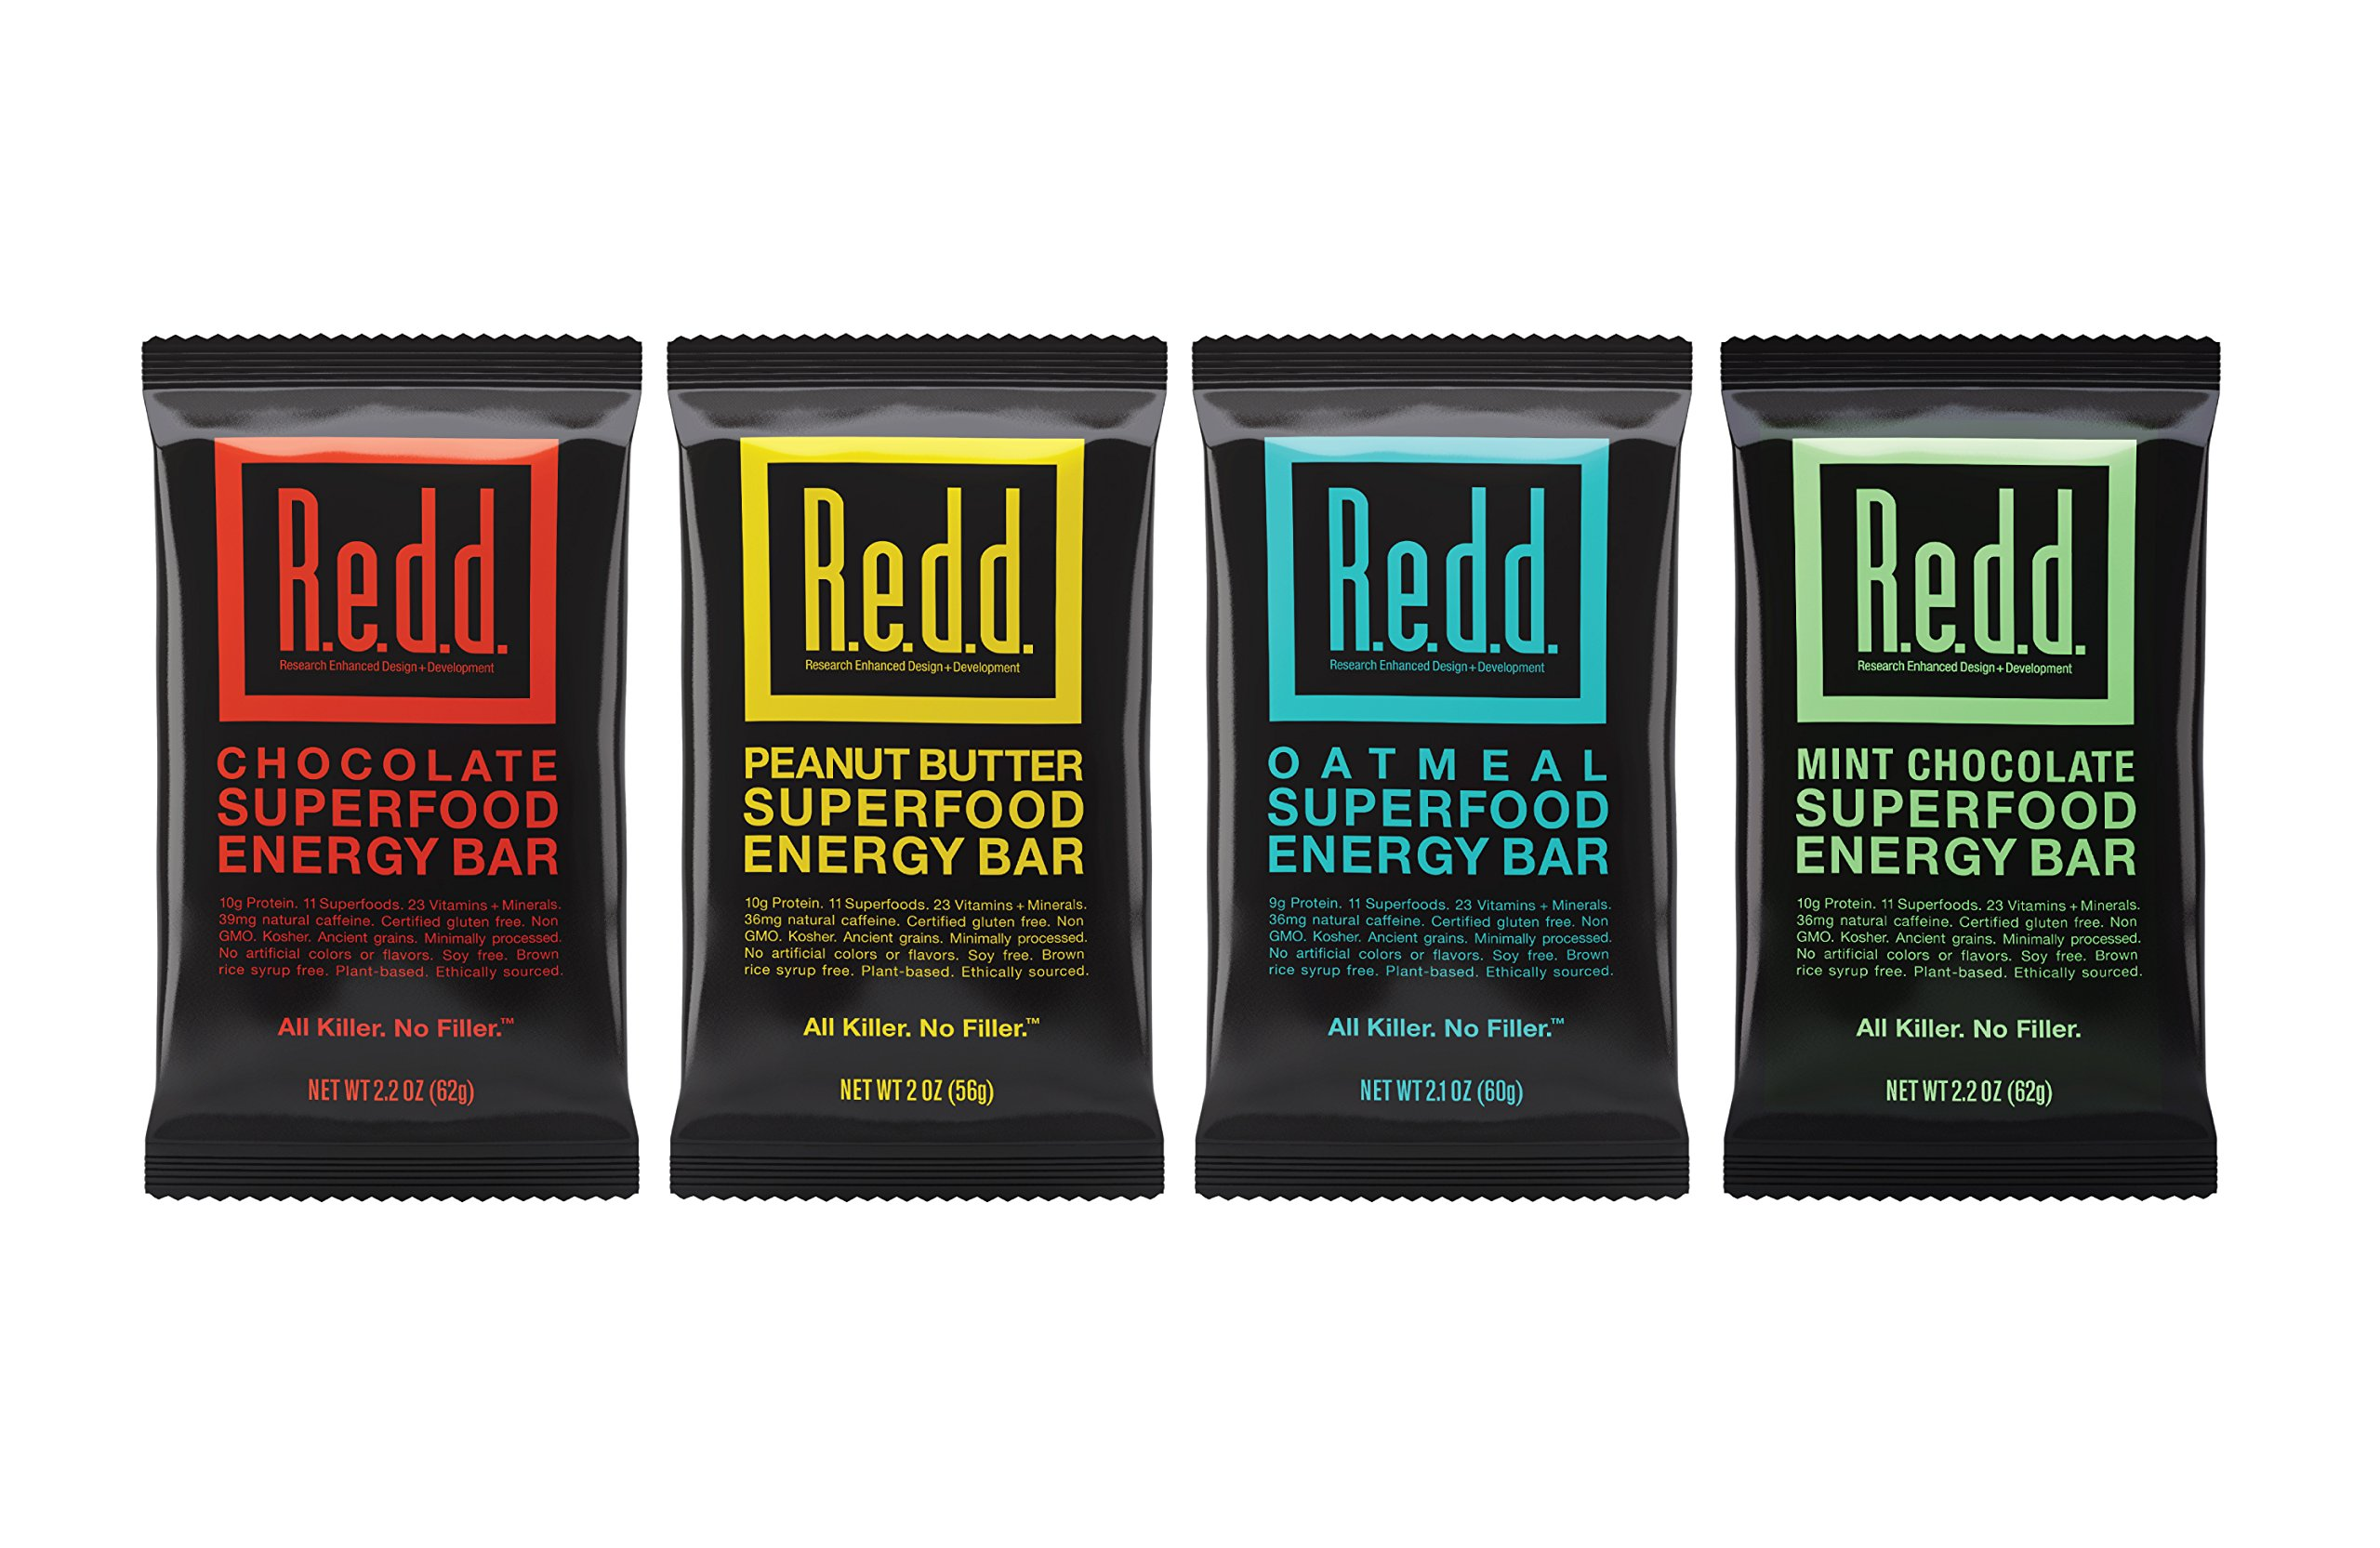 Redd Gluten Free Vegan Superfood Energy Bar Variety Pack, 8 Bars